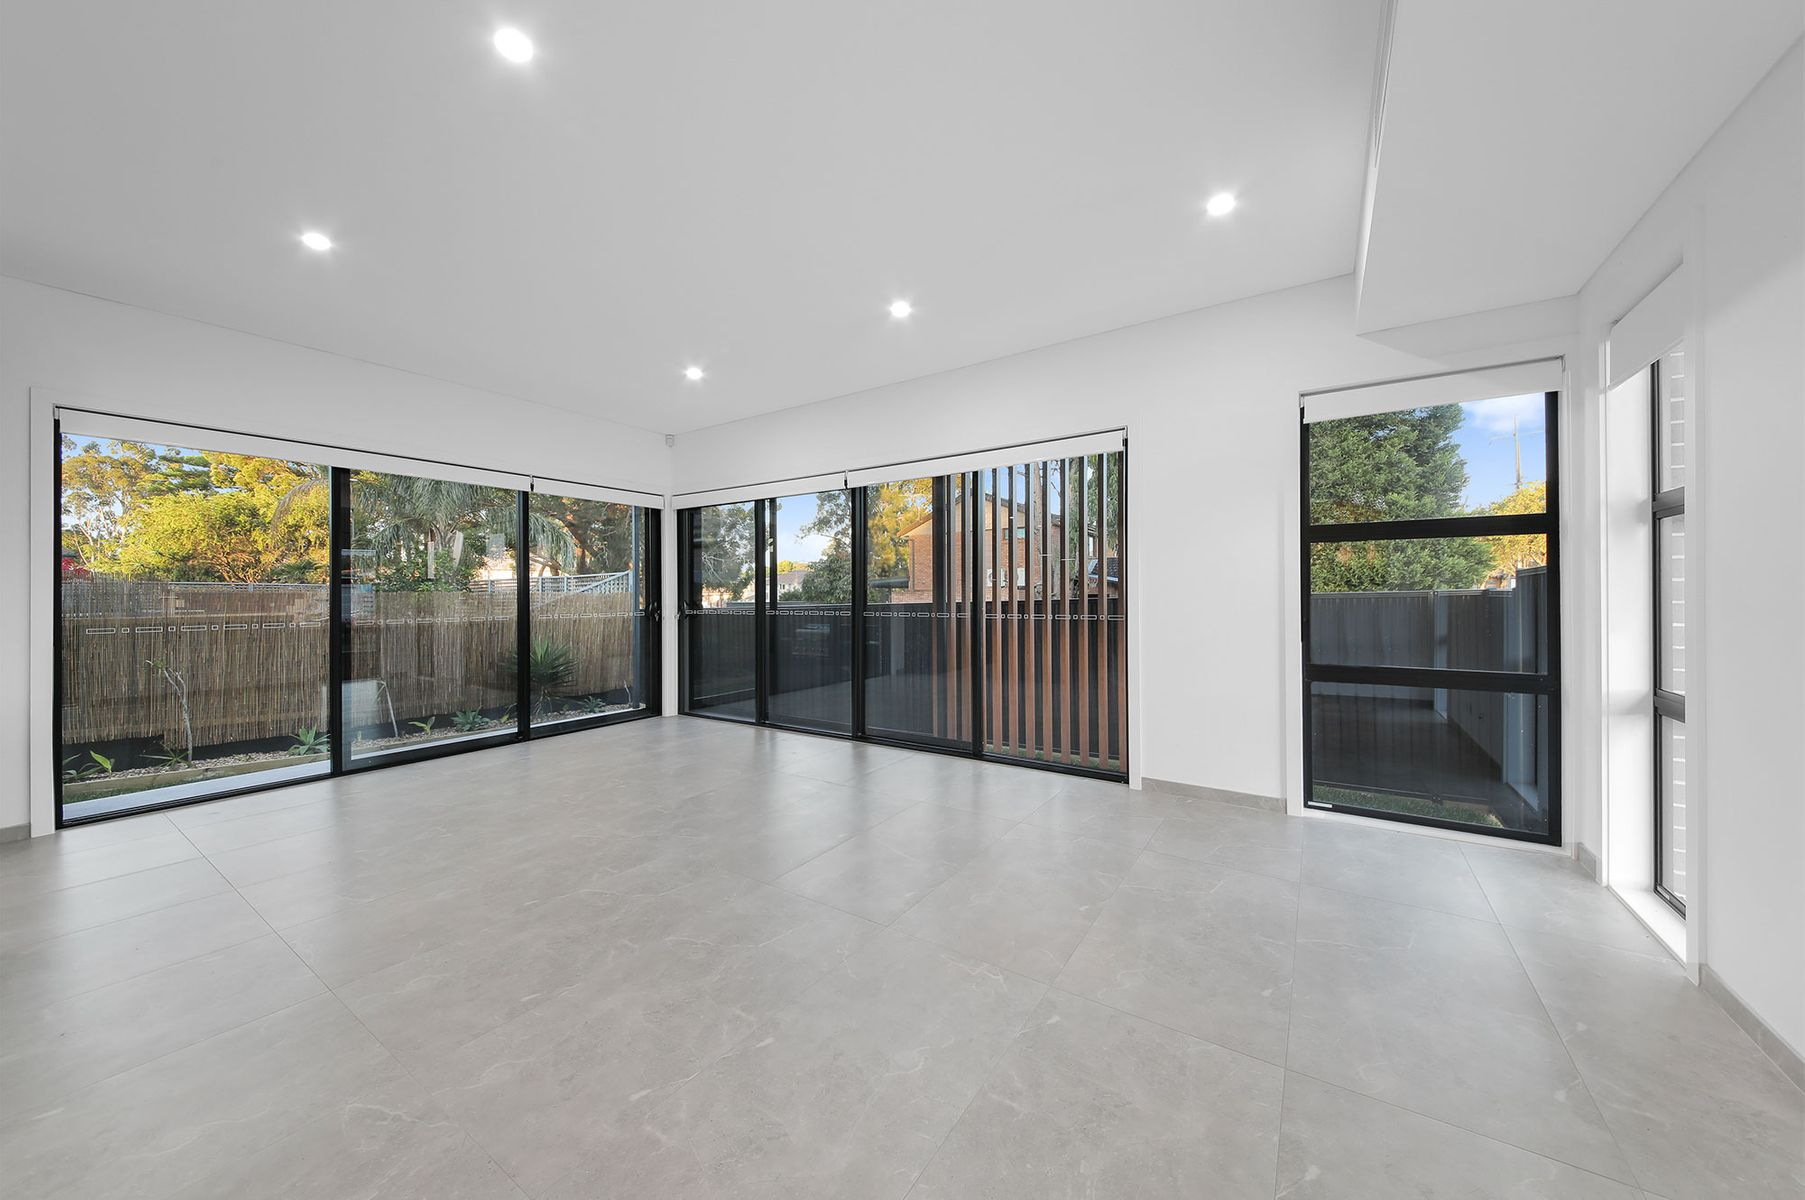 1A Parkhurst Avenue, Panania, NSW 2213